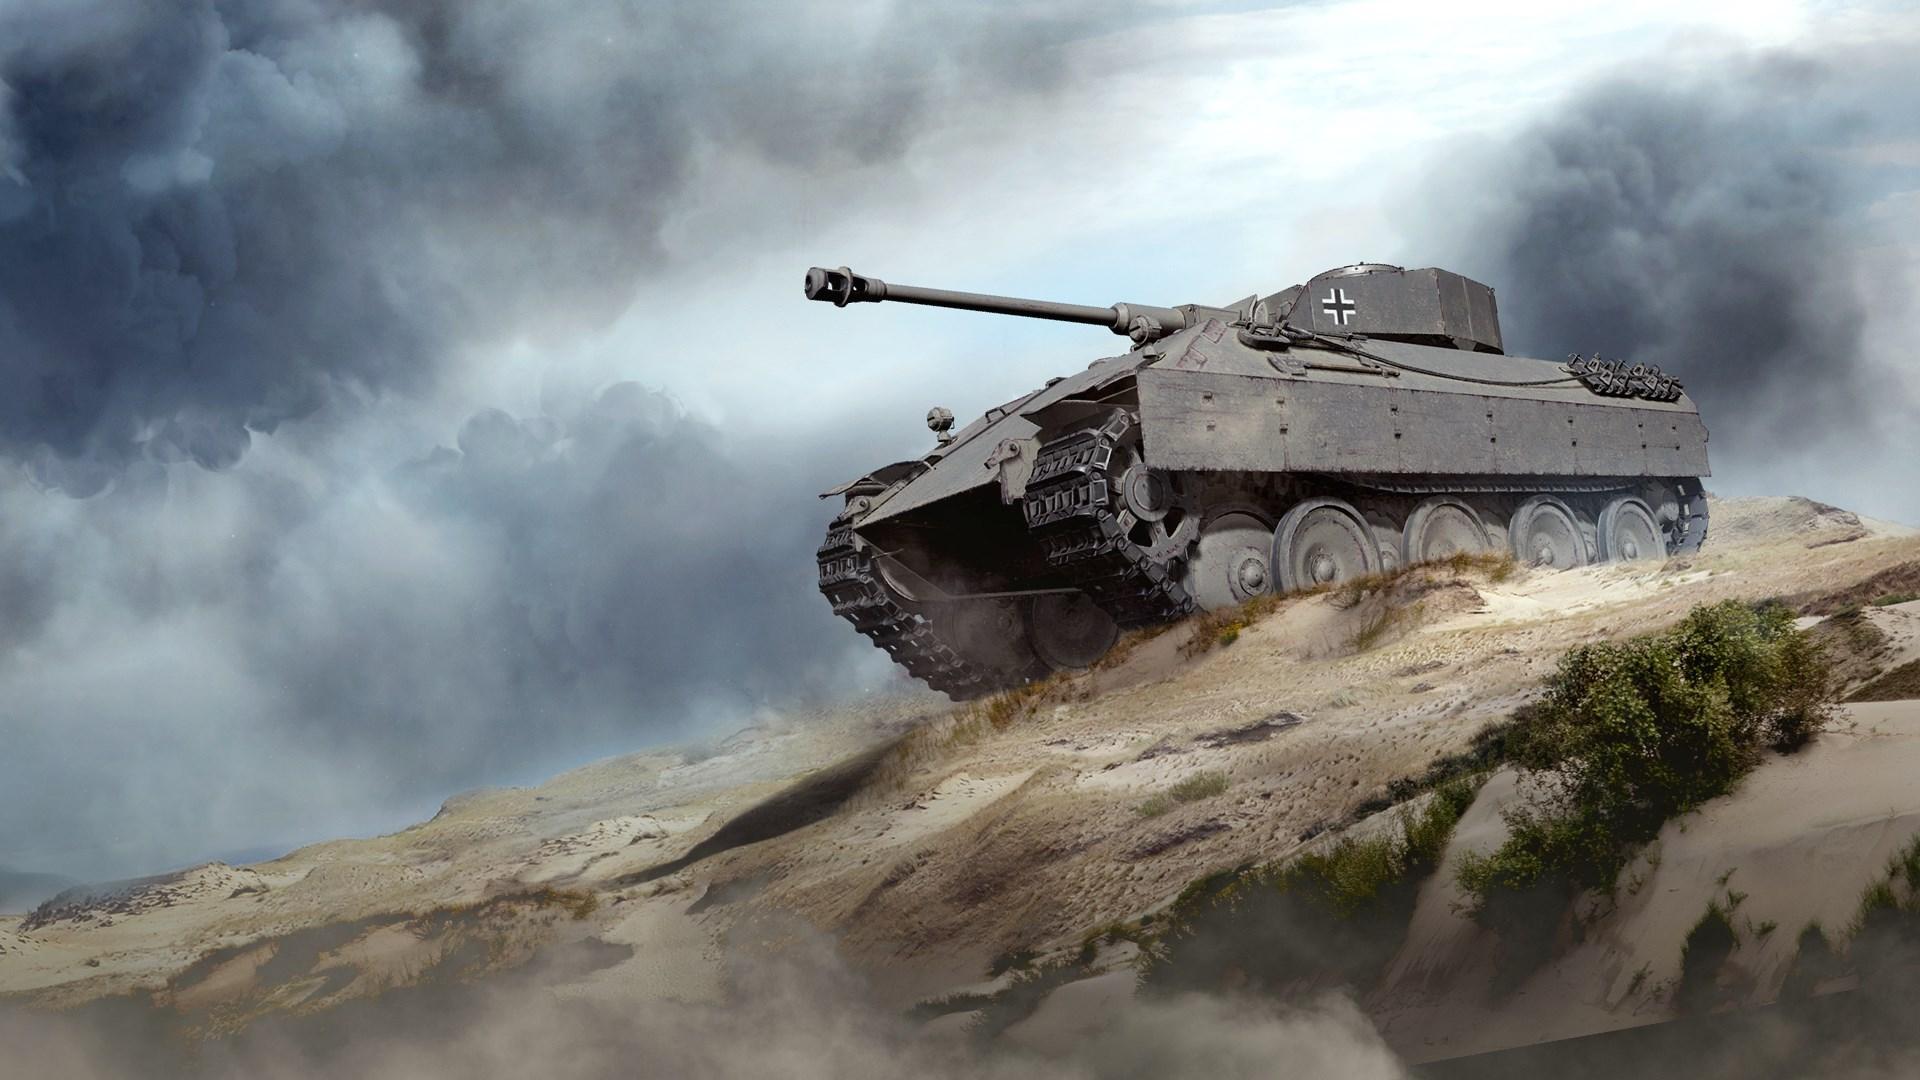 World of Tanks - Pz. Kpfw. V/IV